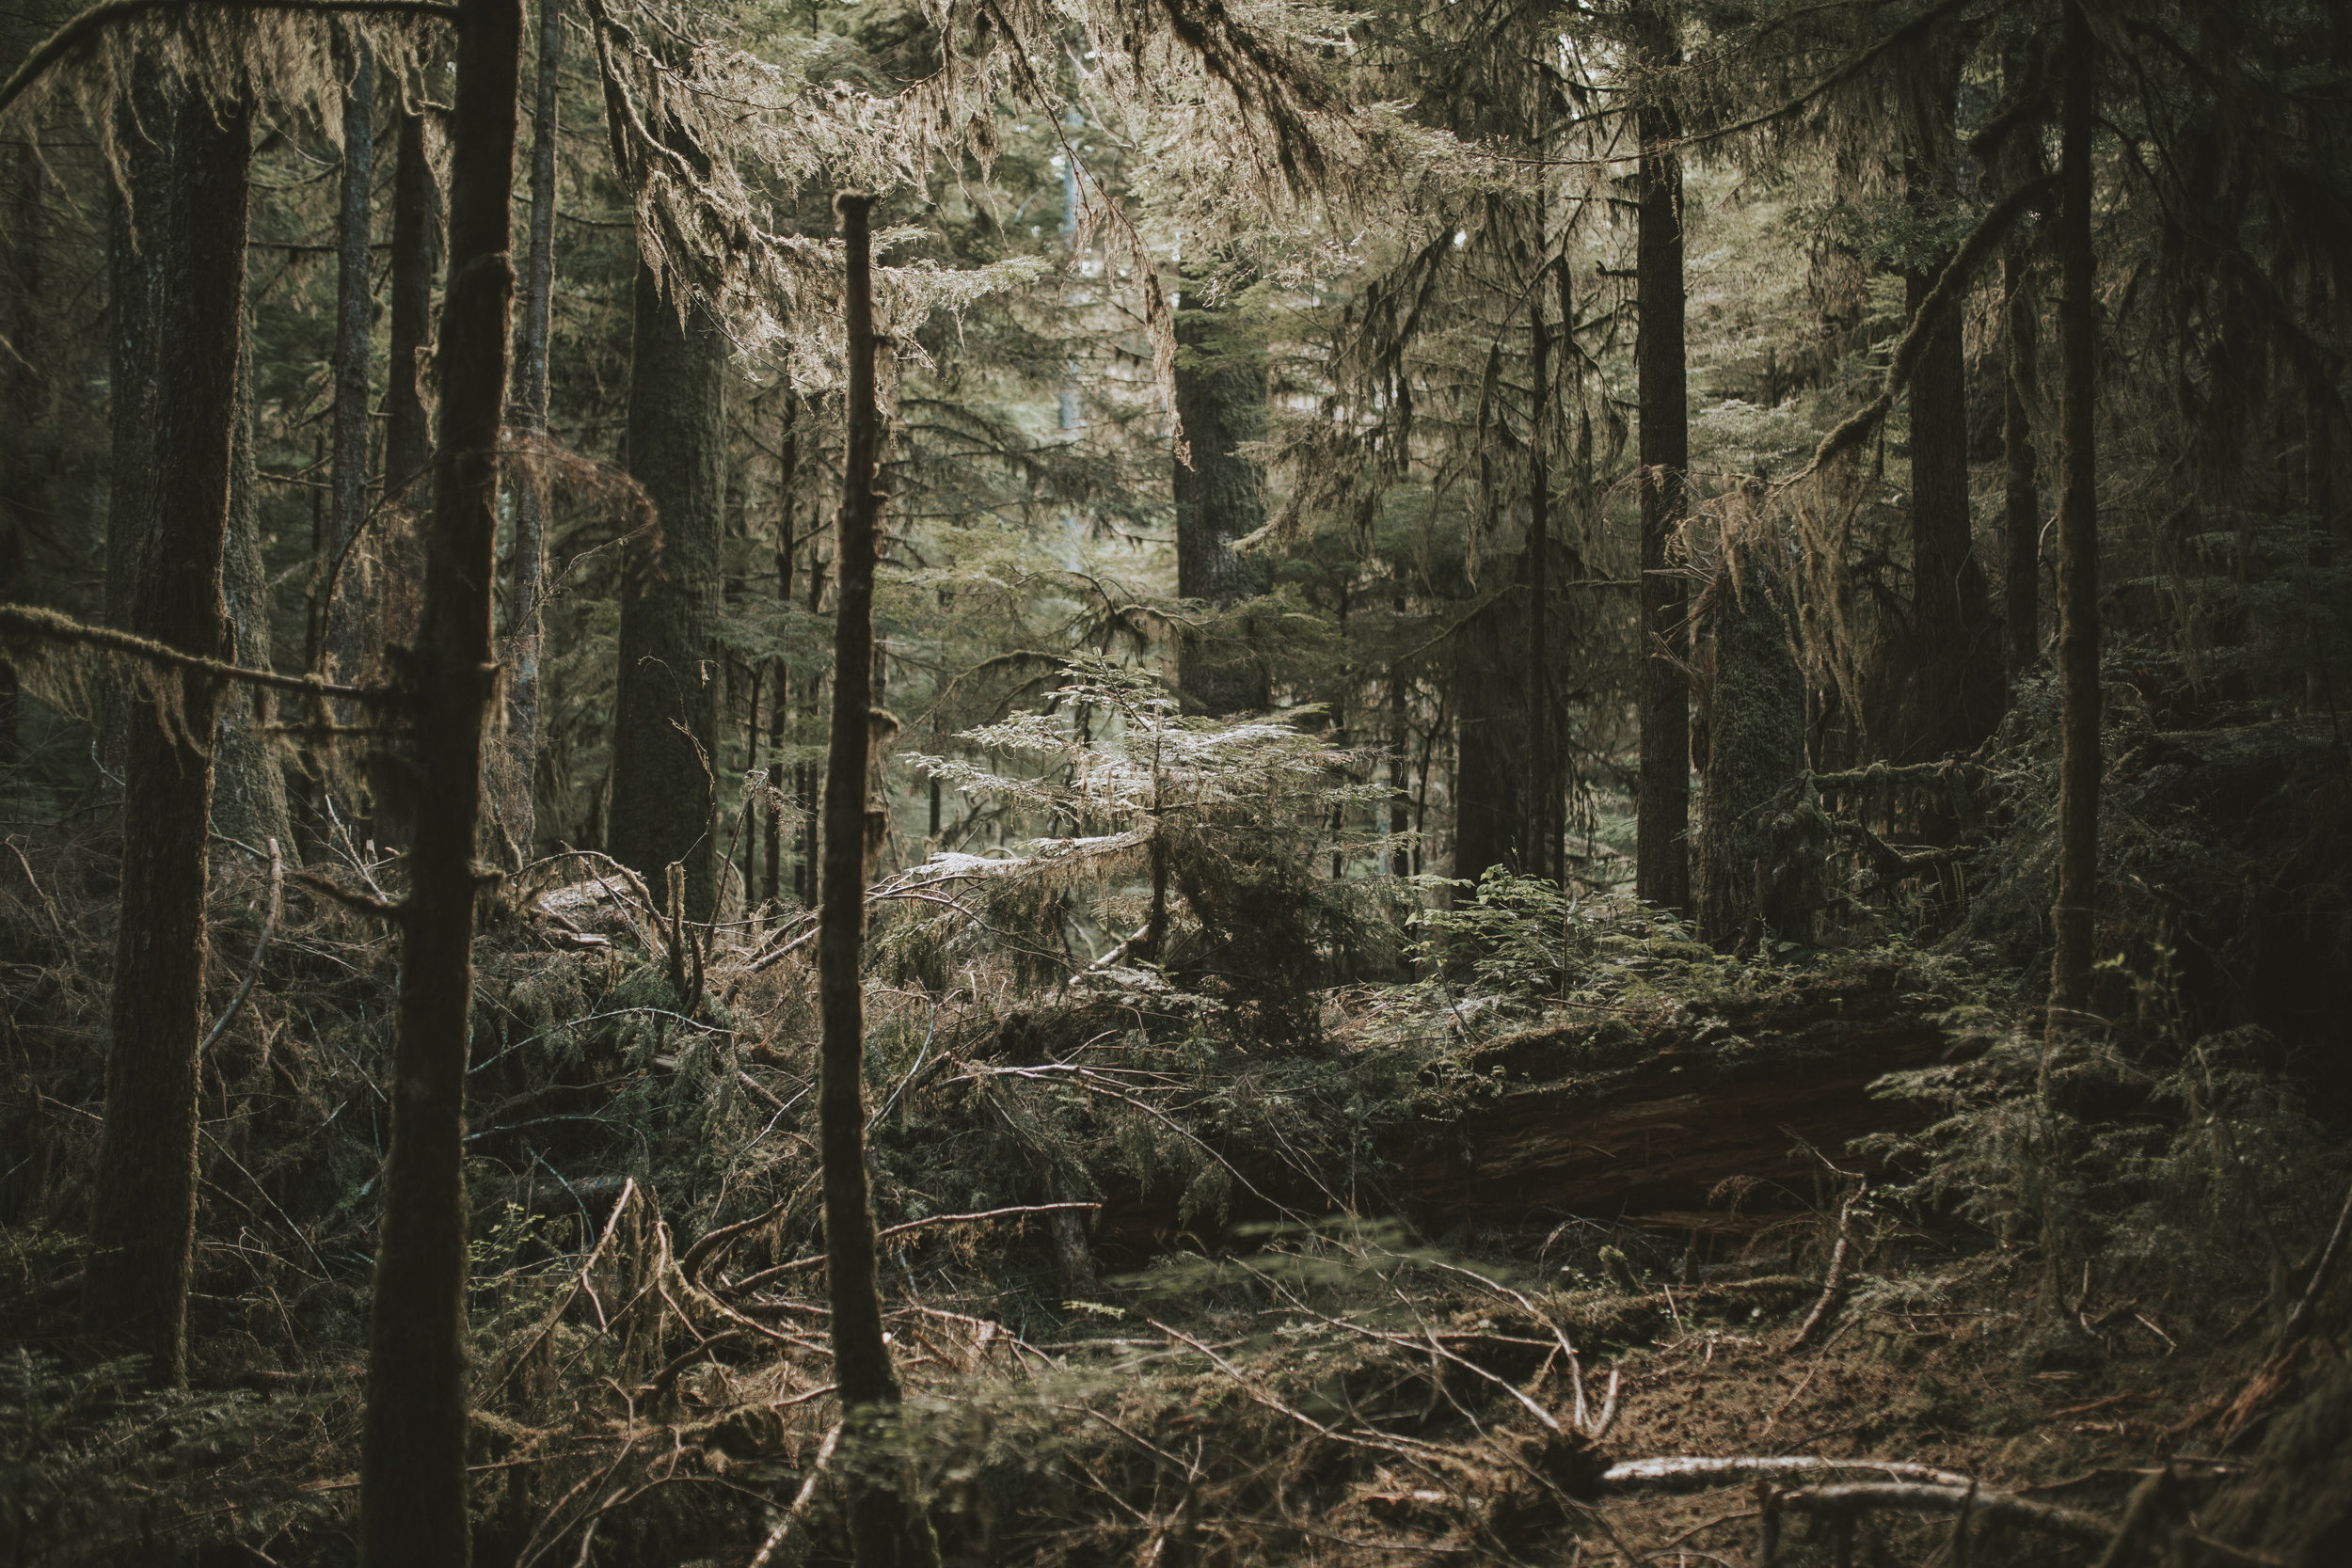 patagonia-2019-emilybeekscreative-167.jpg